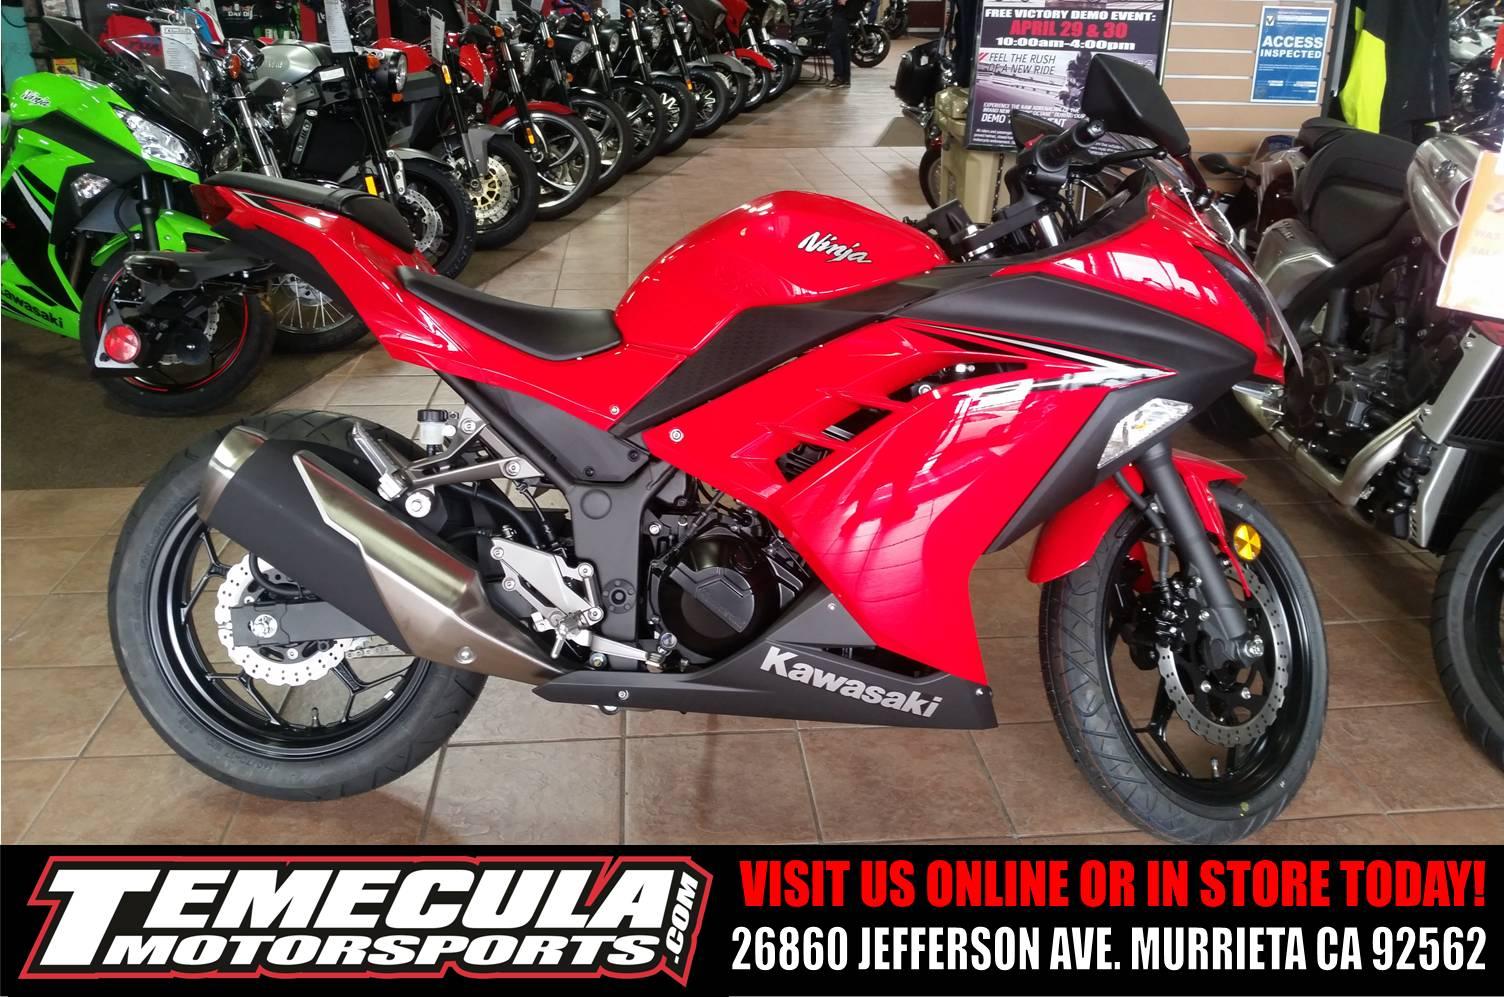 2016 Kawasaki Ninja 300 in Murrieta, California